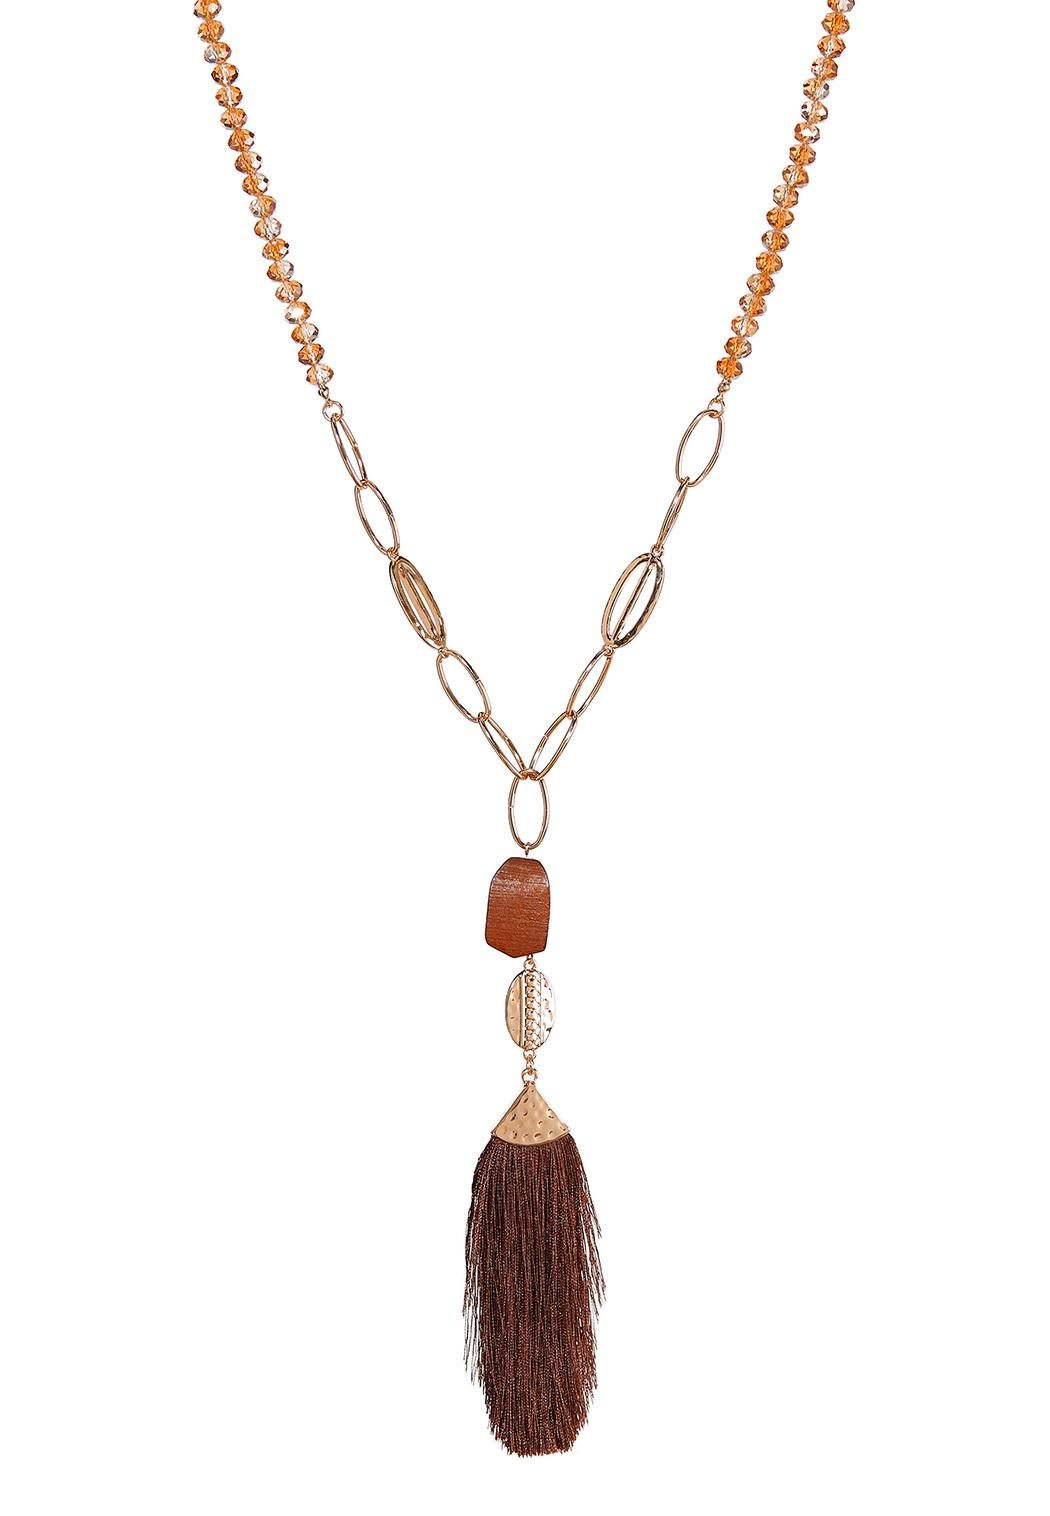 Tasseled Rondelle Bead Necklace